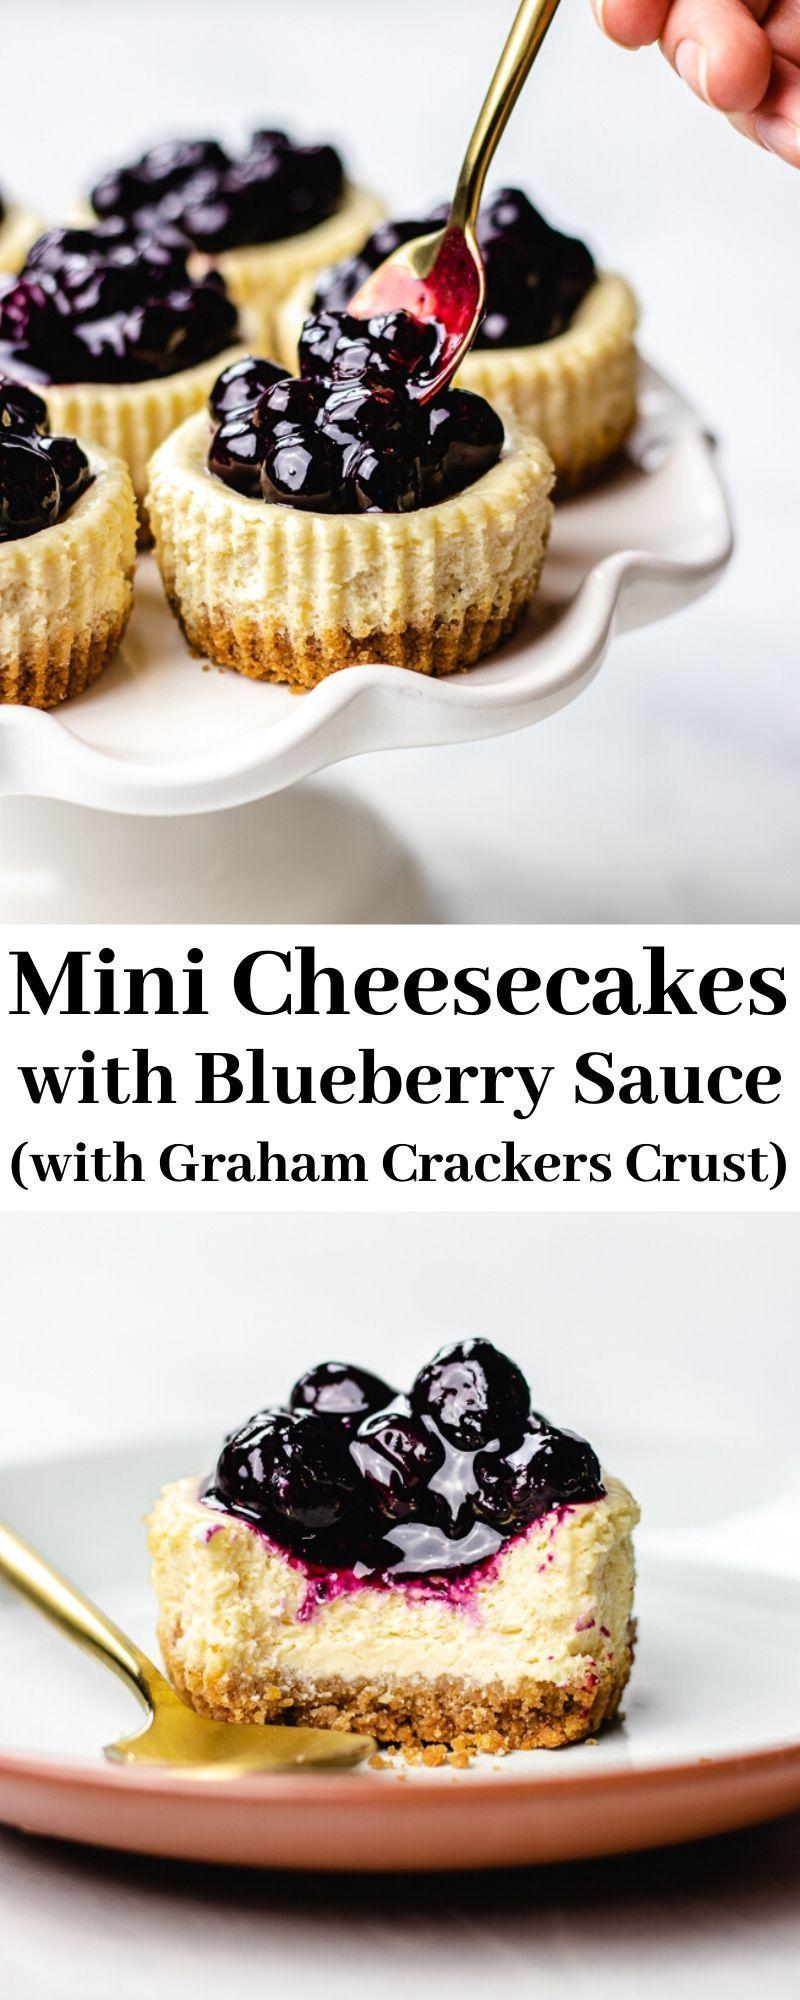 Gluten Free Mini Cheesecakes With Blueberry Sauce Veronika S Kitchen Recipe In 2020 Mini Dessert Recipes Mini Cheesecakes Baking Recipes